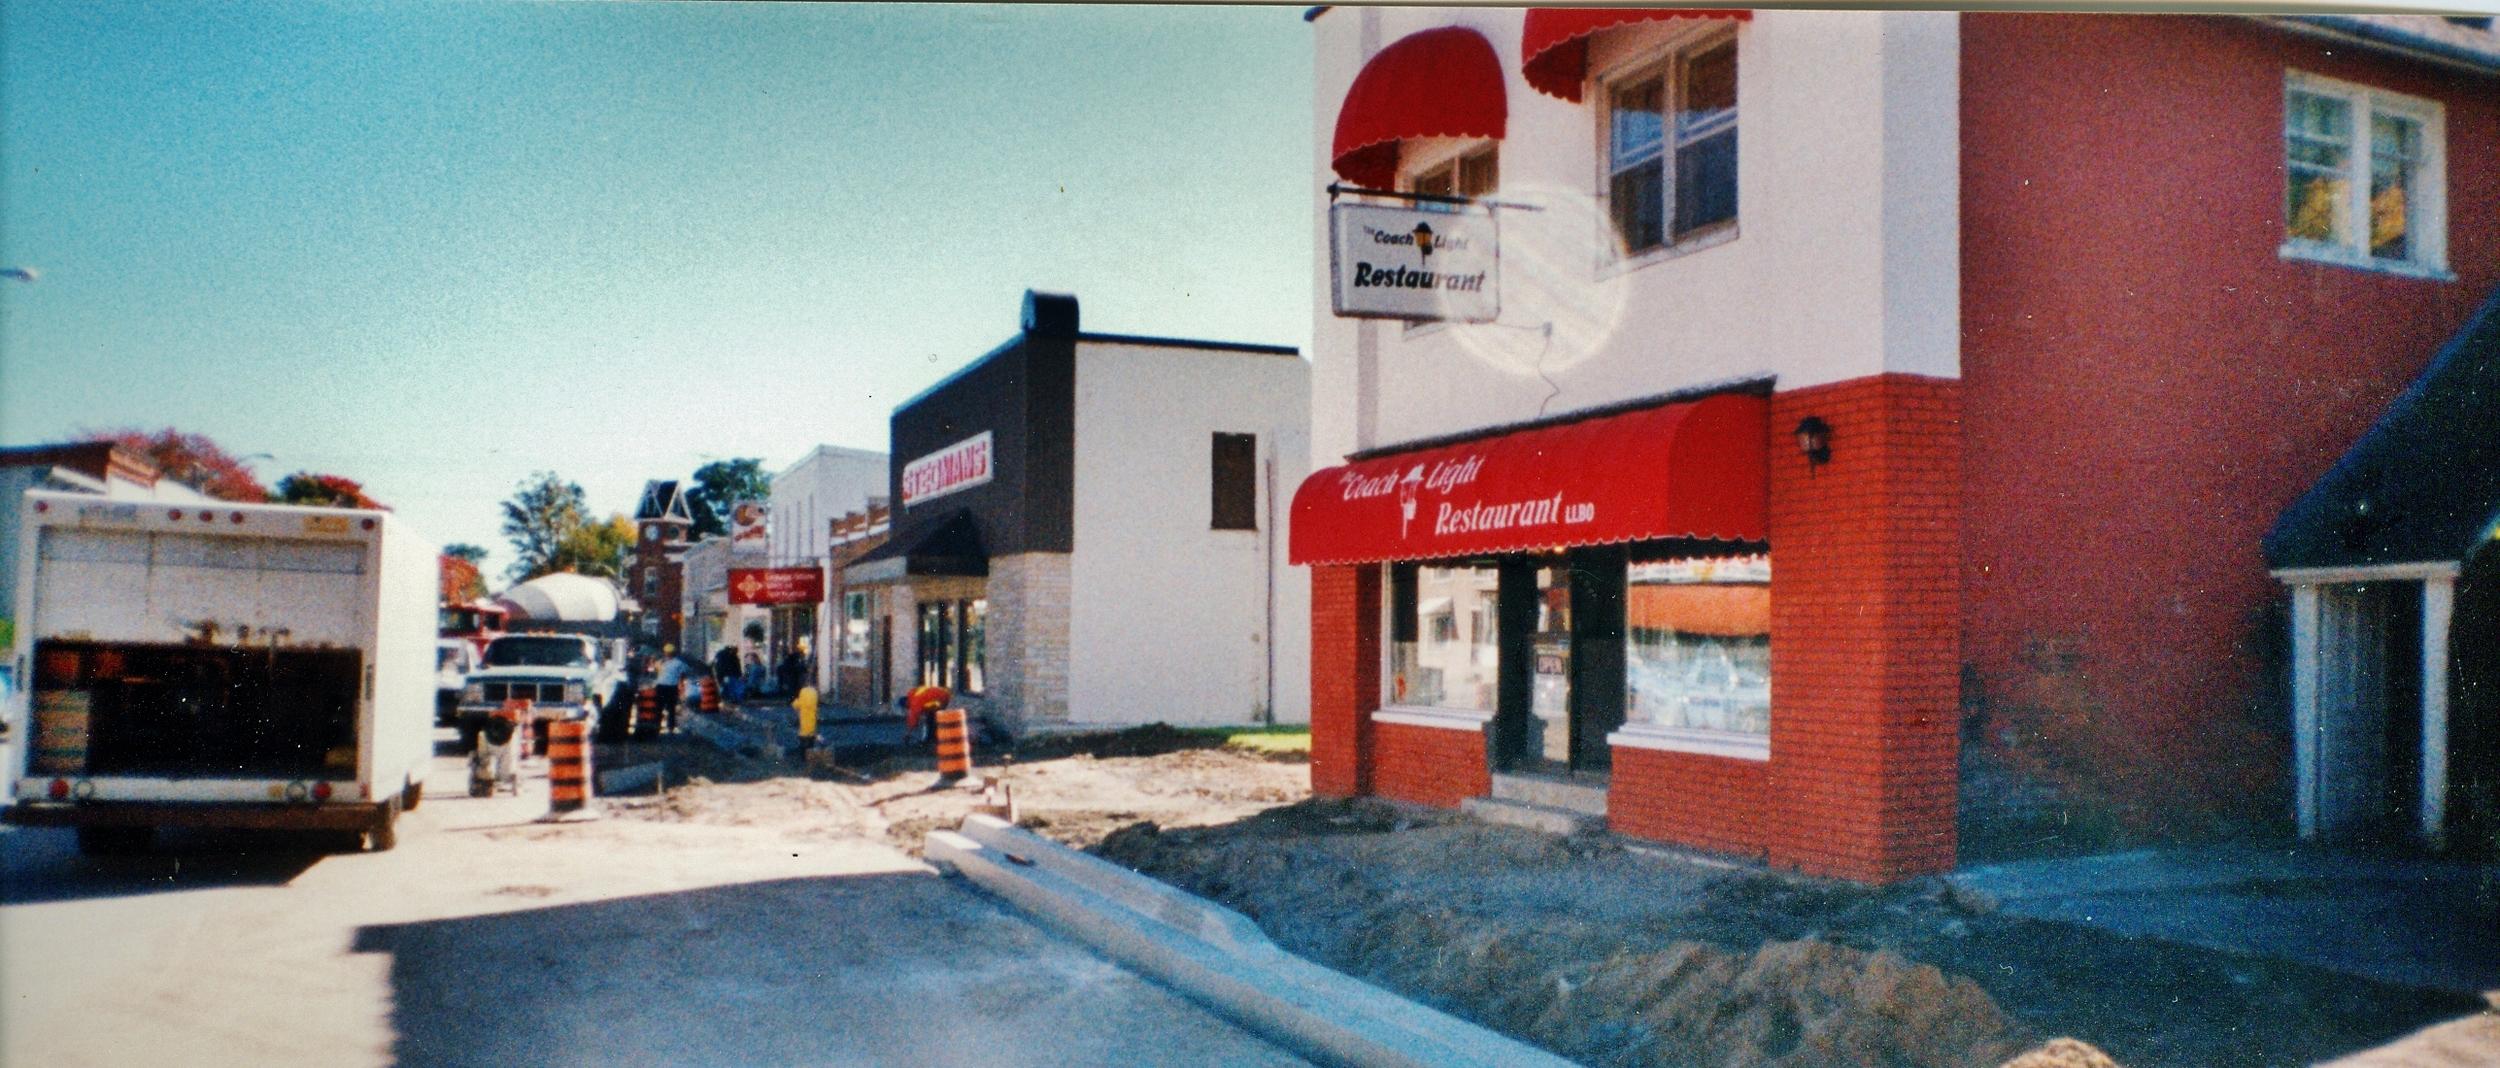 1995 - The Coachlight Restaurant